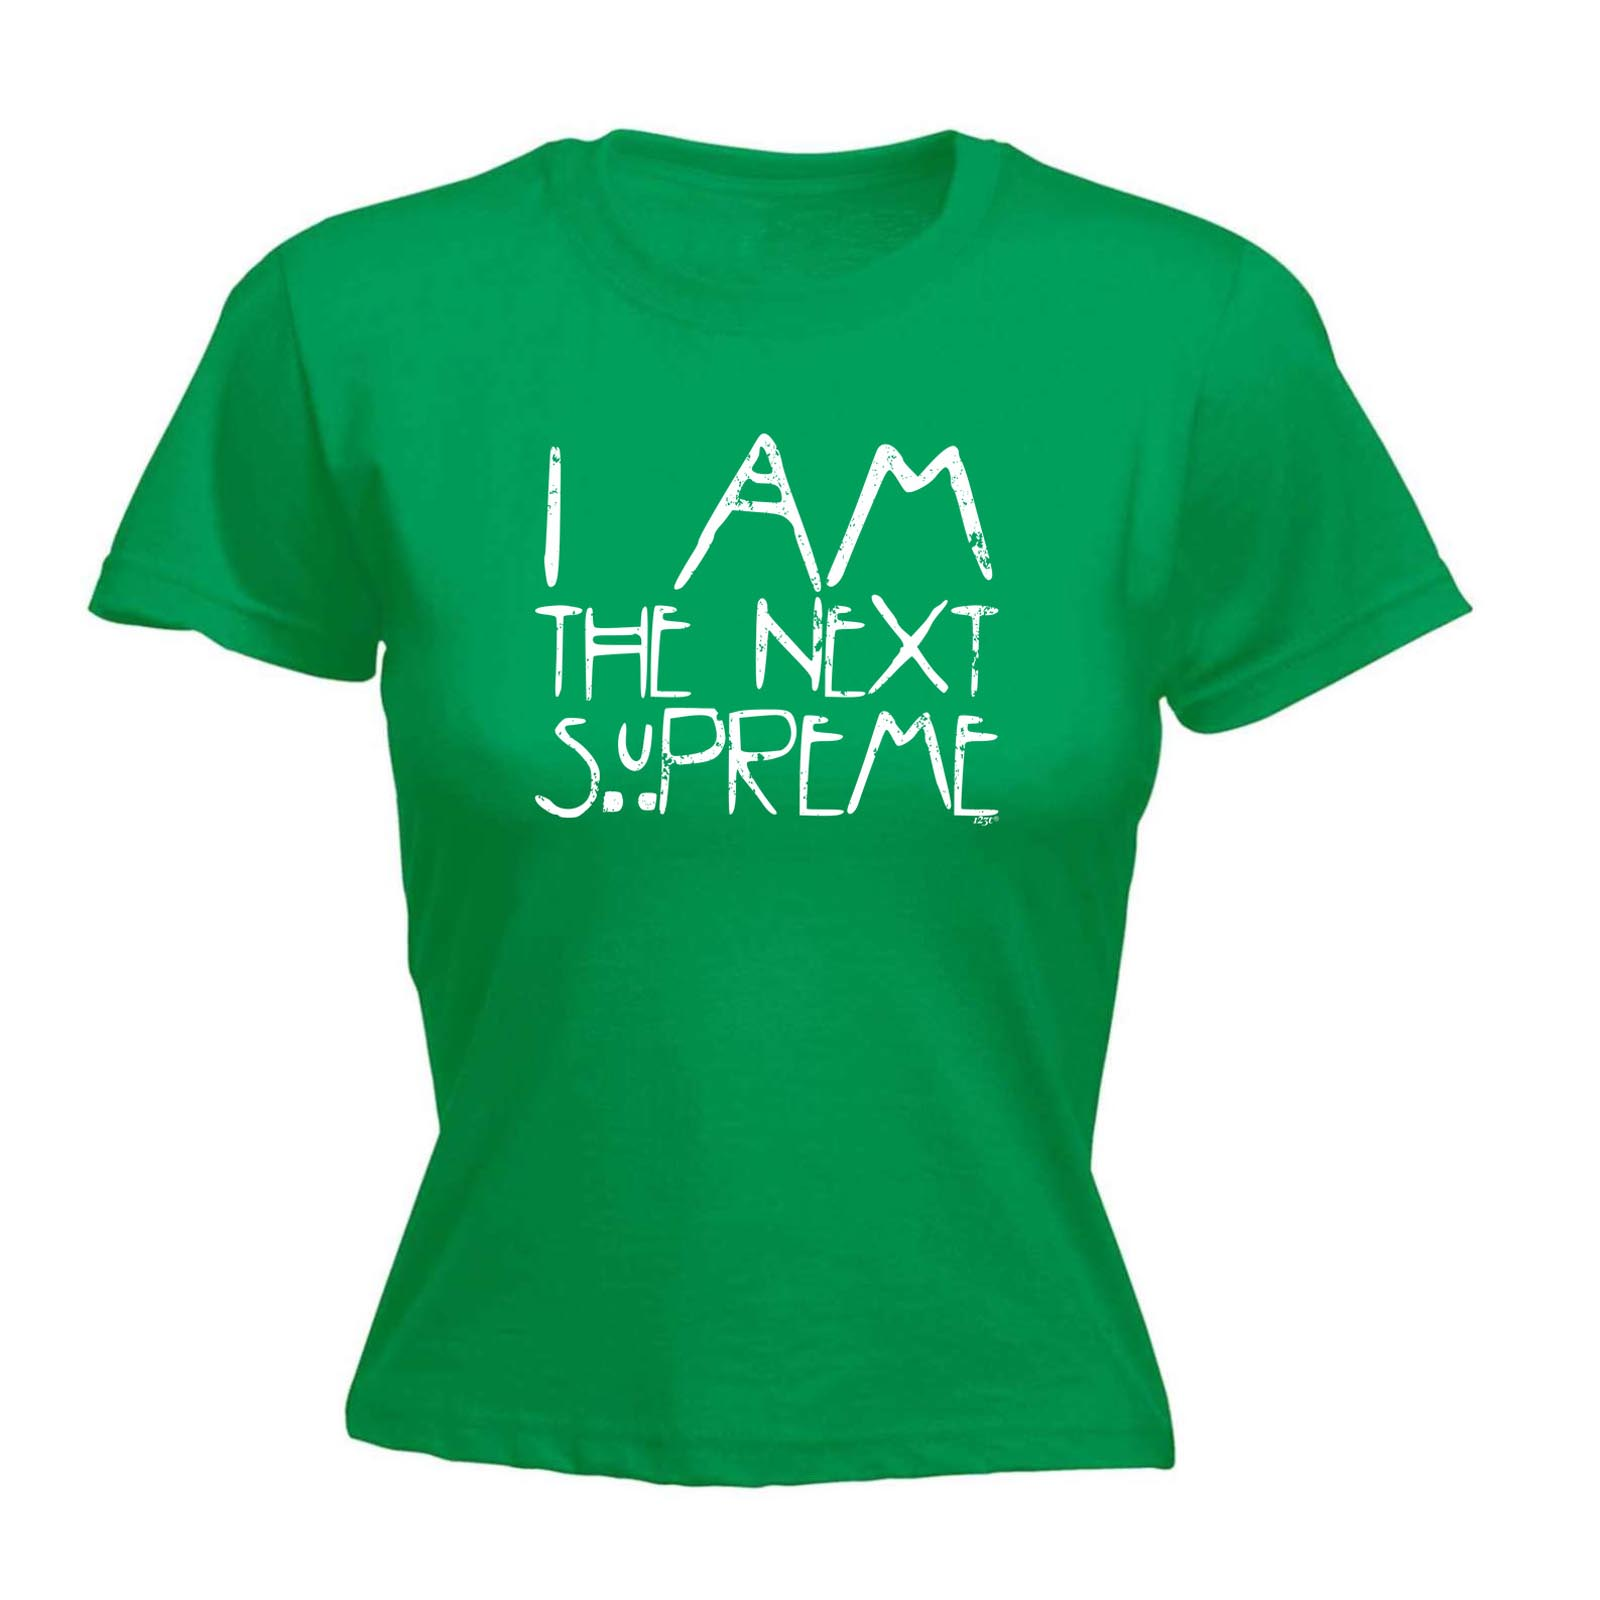 16d56be60 Funny Novelty Tops T-Shirt Womens tee TShirt - The Next Supreme | eBay